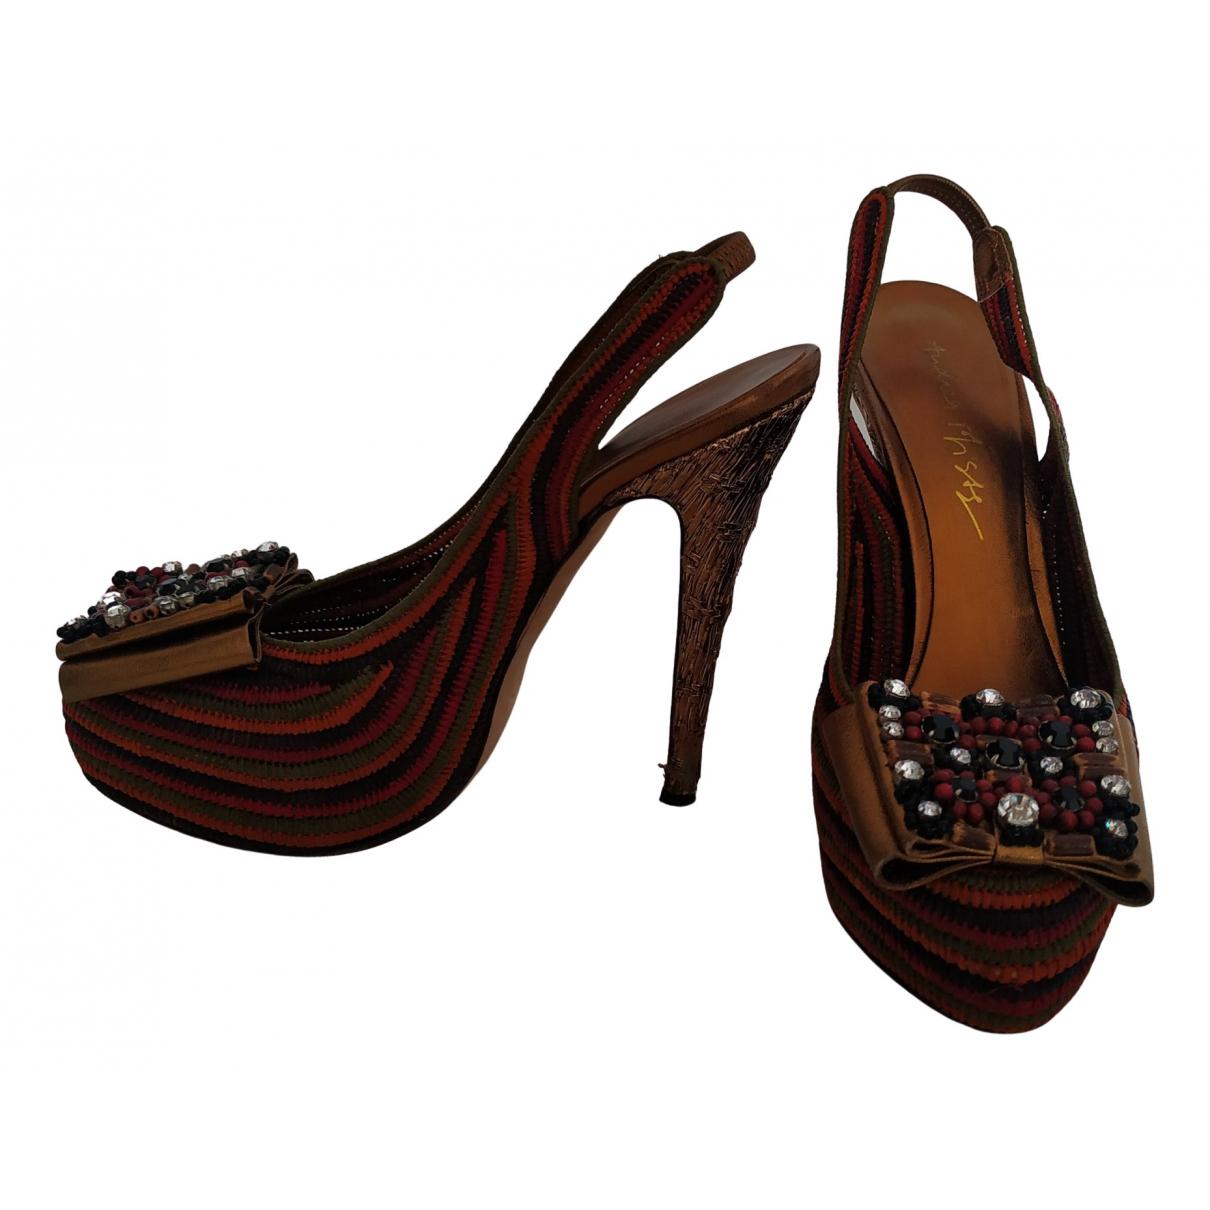 Andrea Pfister N Multicolour Cloth Heels for Women 37 EU